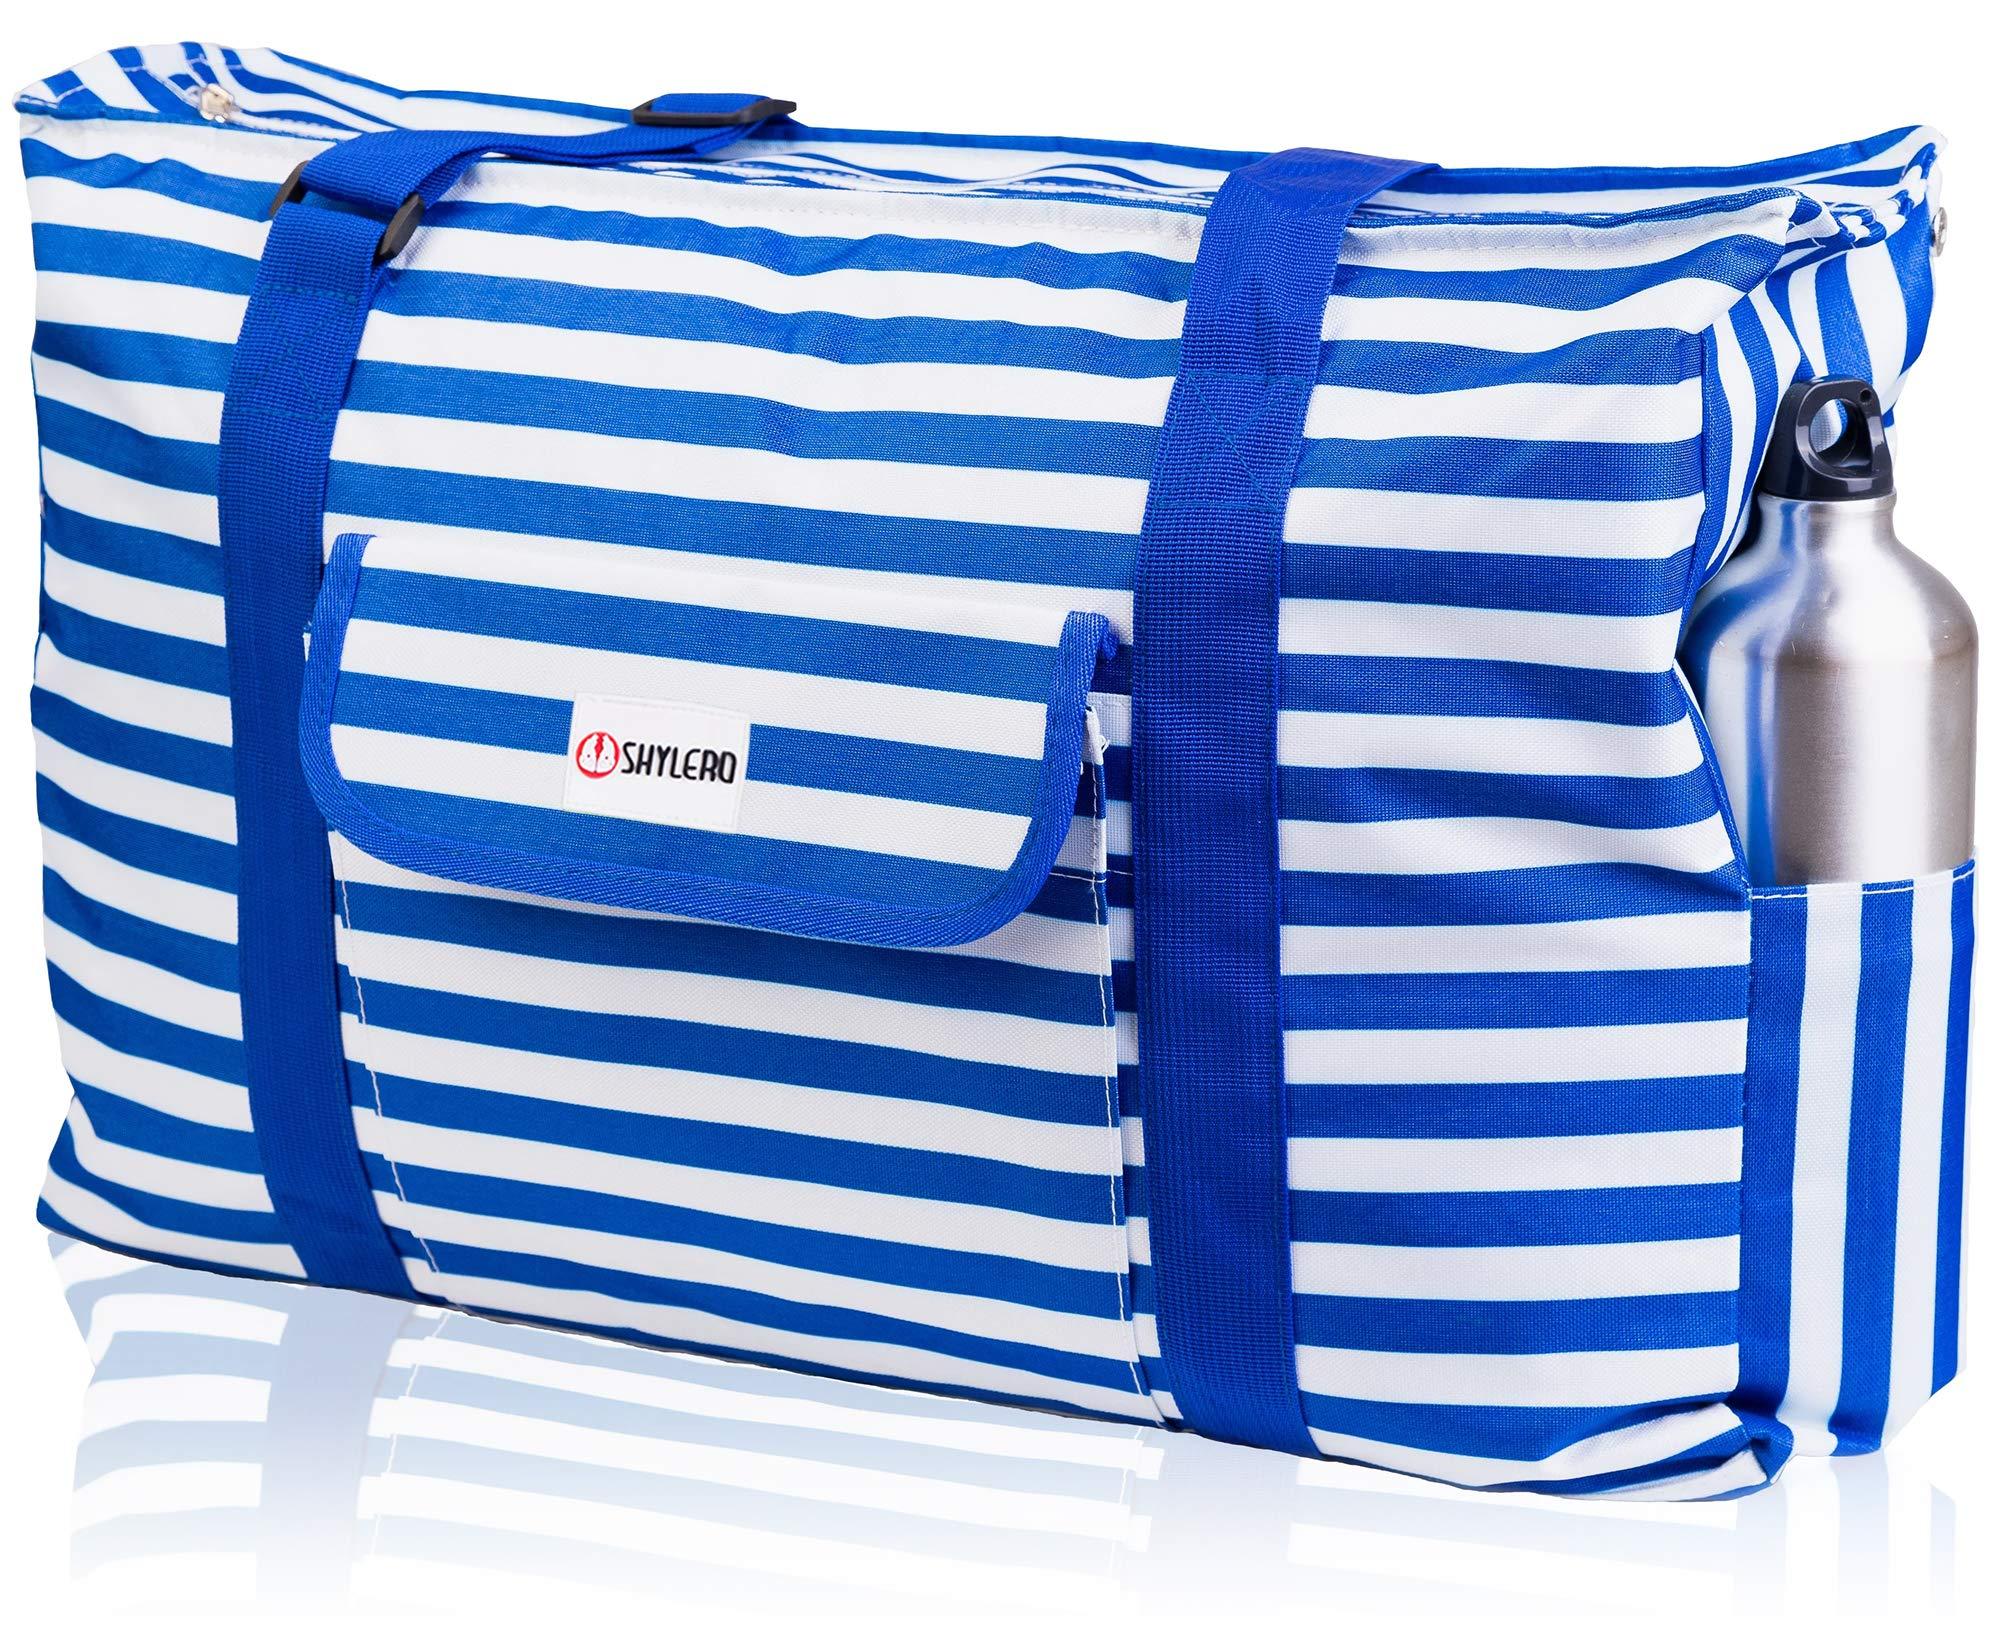 Beach Bag XXL. 100% Waterproof (IP64). L22 xH15 xW6 w Ribbon Handles (Padded Grip), Top Zip, Three Outside Pockets. Blue Stripes Beach Tote Includes Phone Case, Built-In Key Holder, Bottle Opener